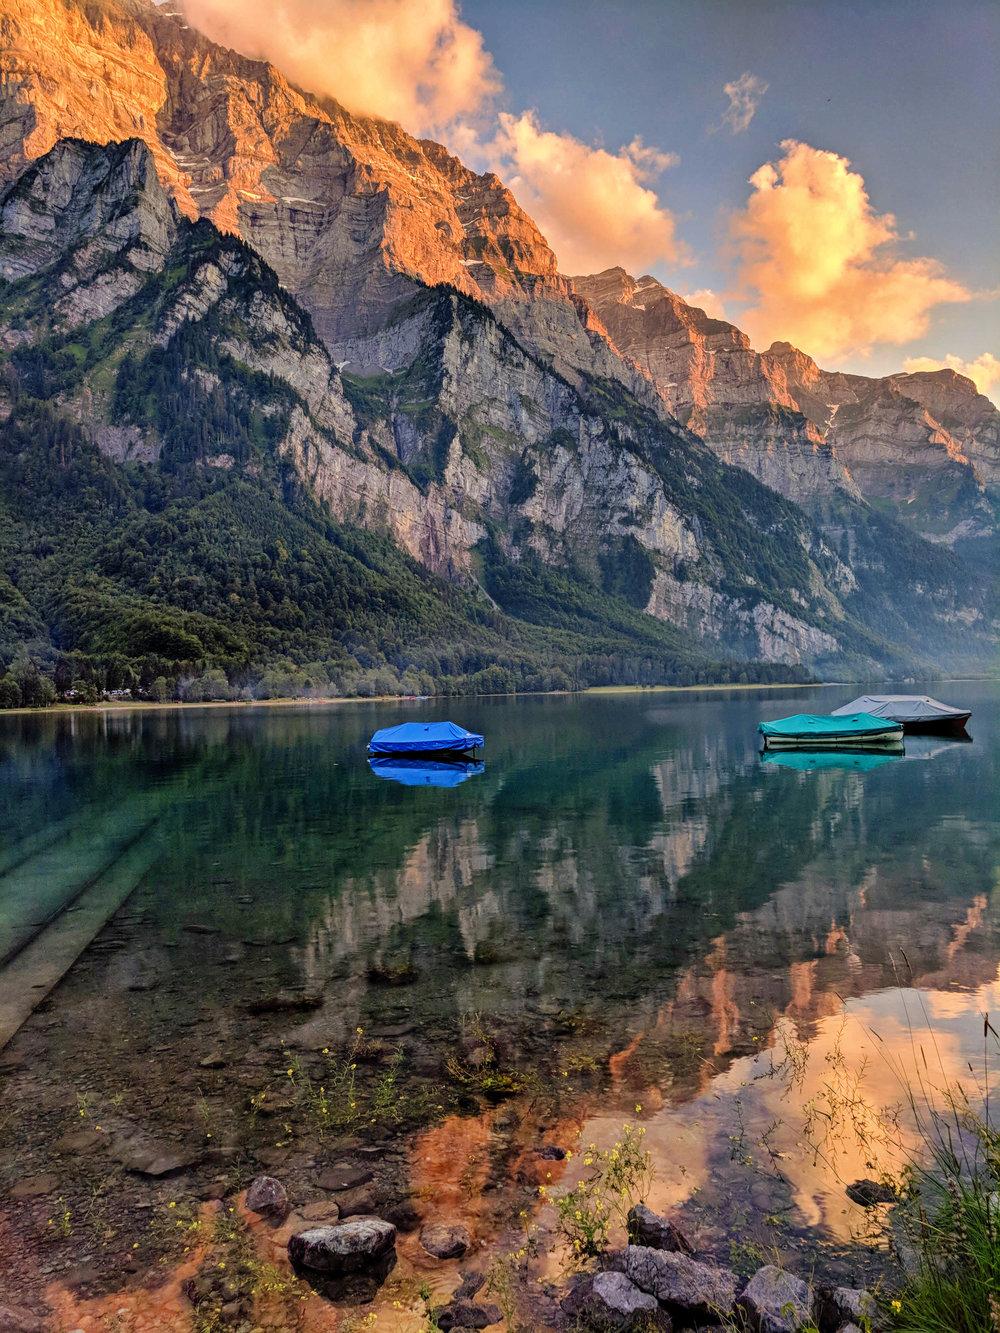 Mobile phone Klontalersee Switzerland.jpg